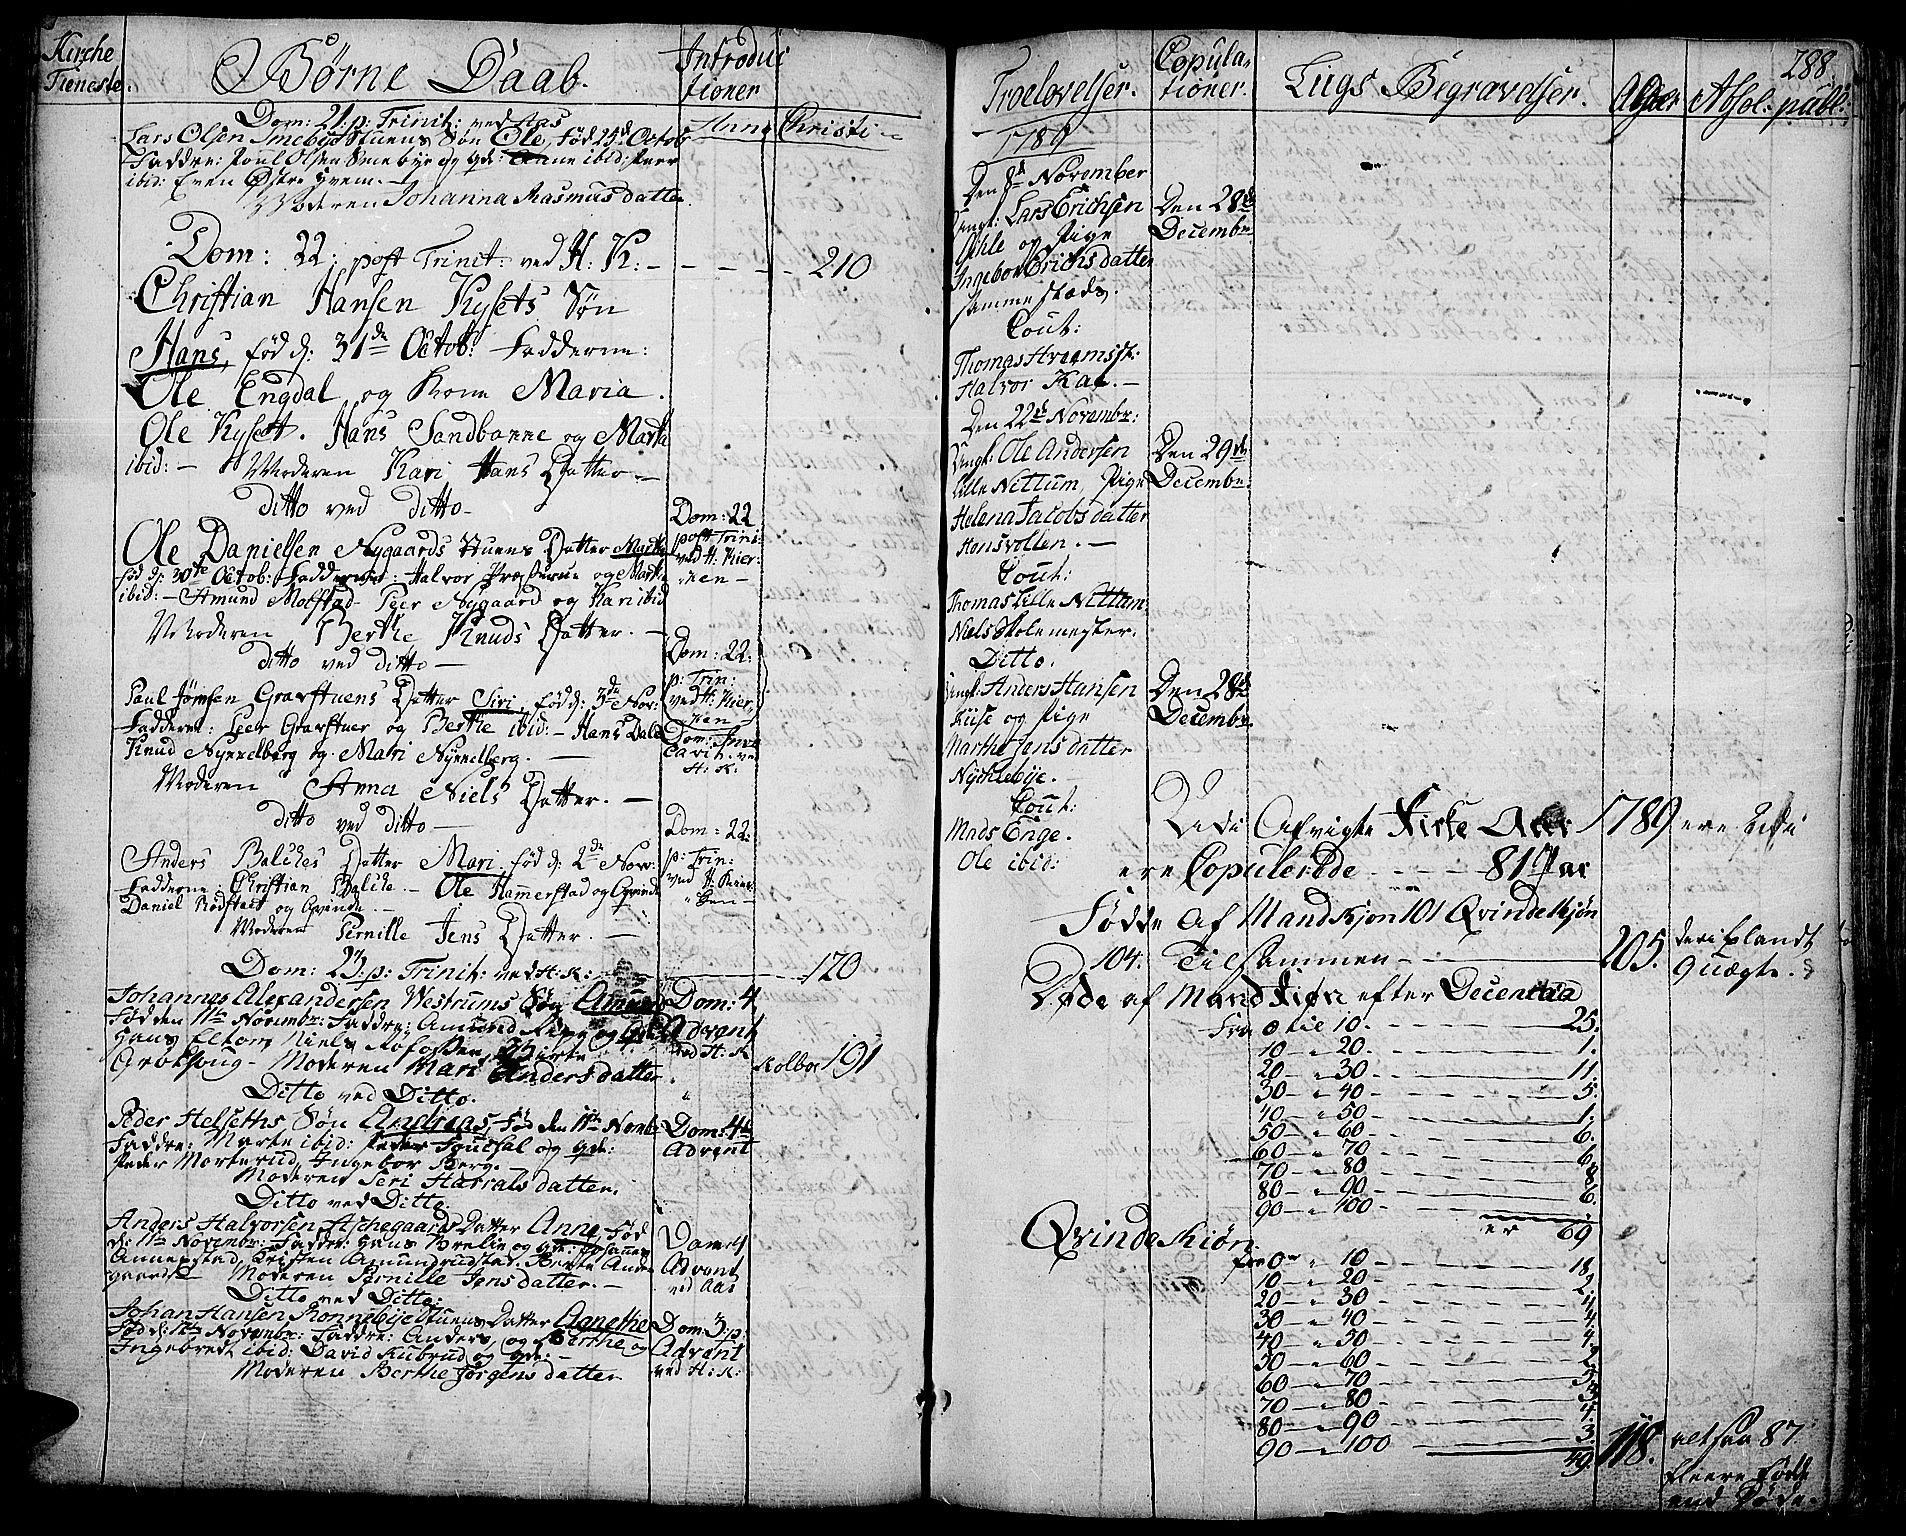 SAH, Toten prestekontor, Ministerialbok nr. 6, 1773-1793, s. 288